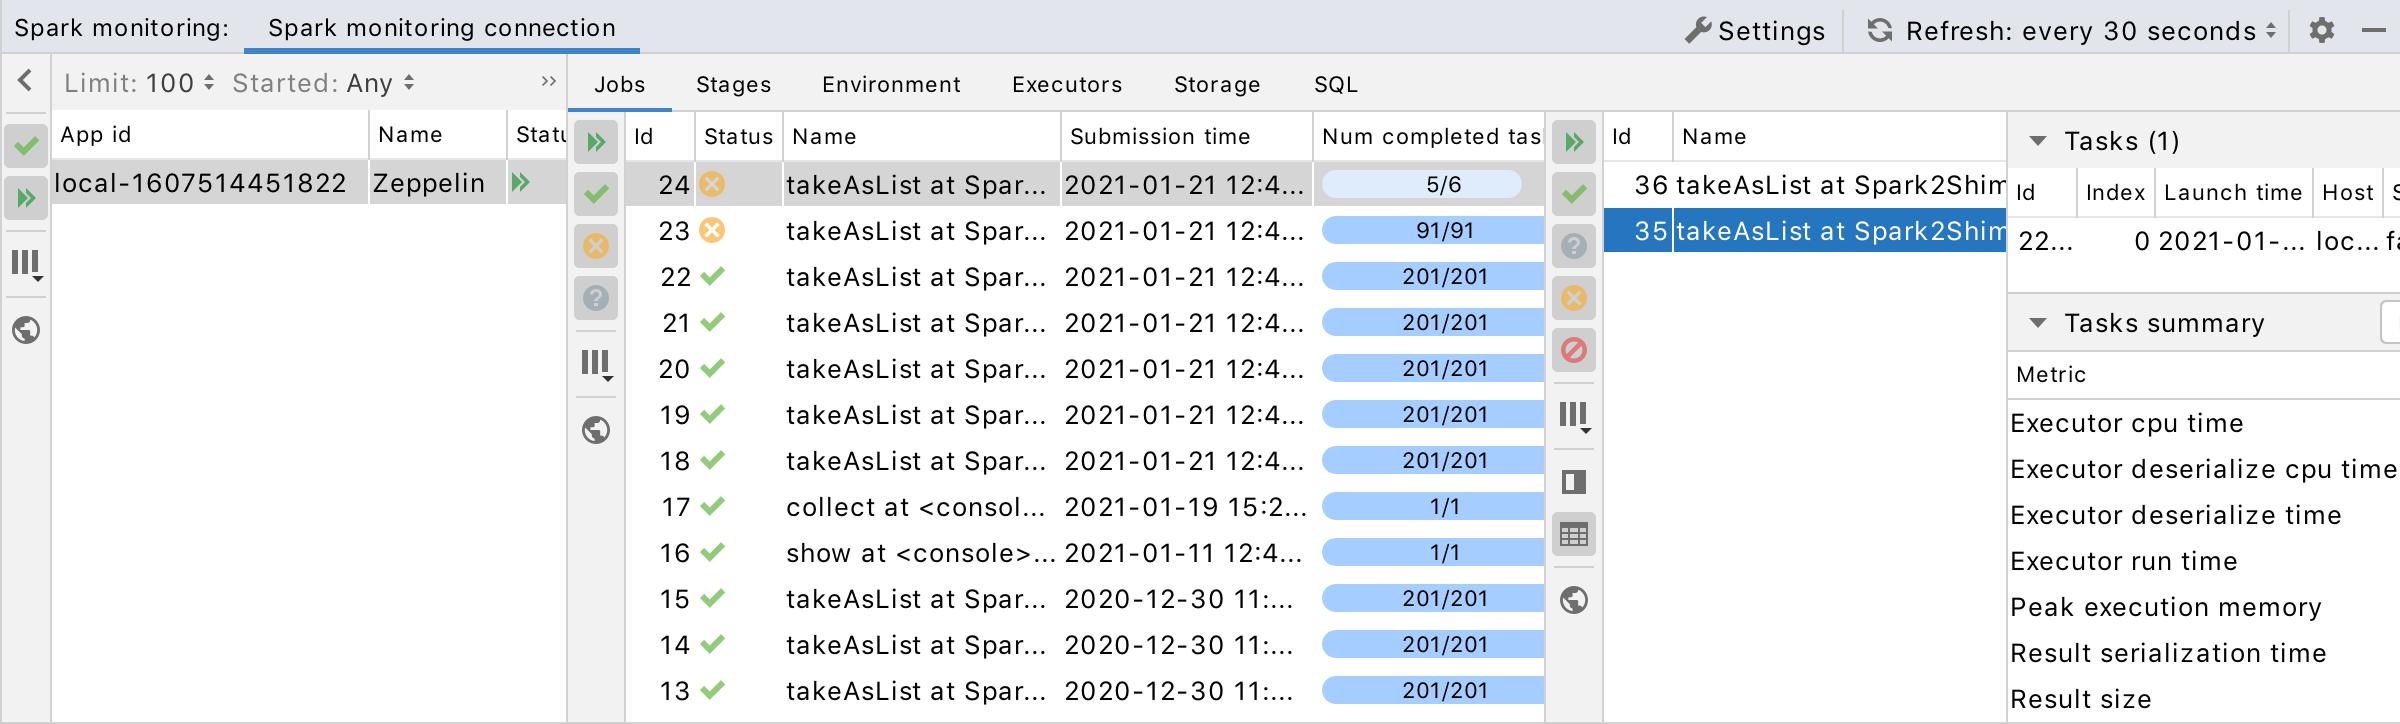 Spark monitoring: jobs